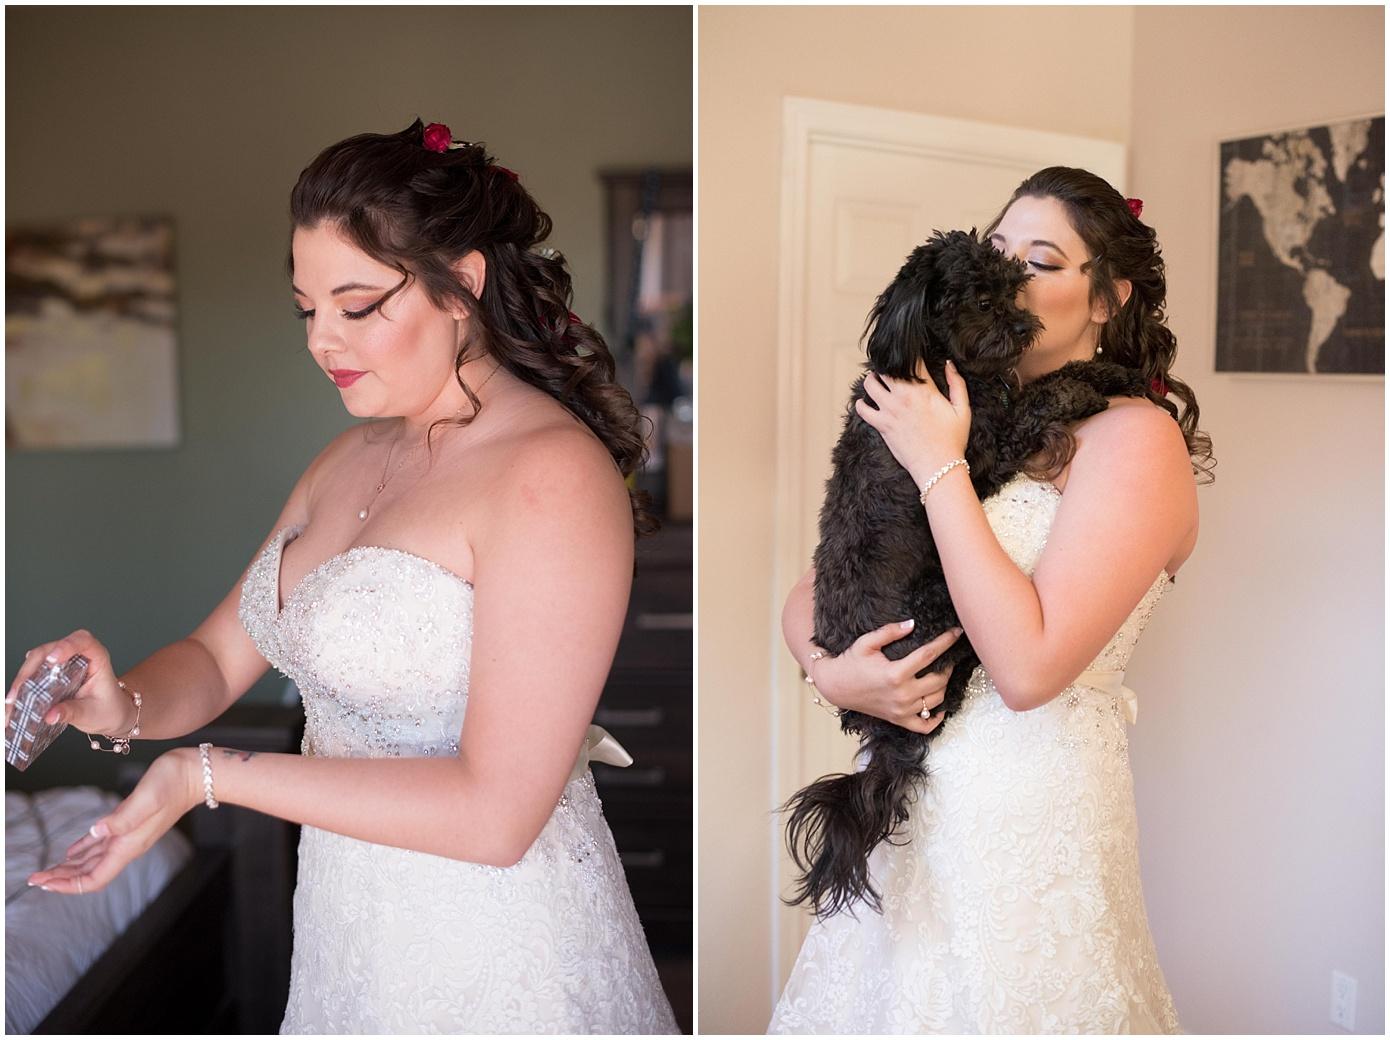 kayla kitts photography-justine-brian-wedding-balloon-fiesta_0014.jpg